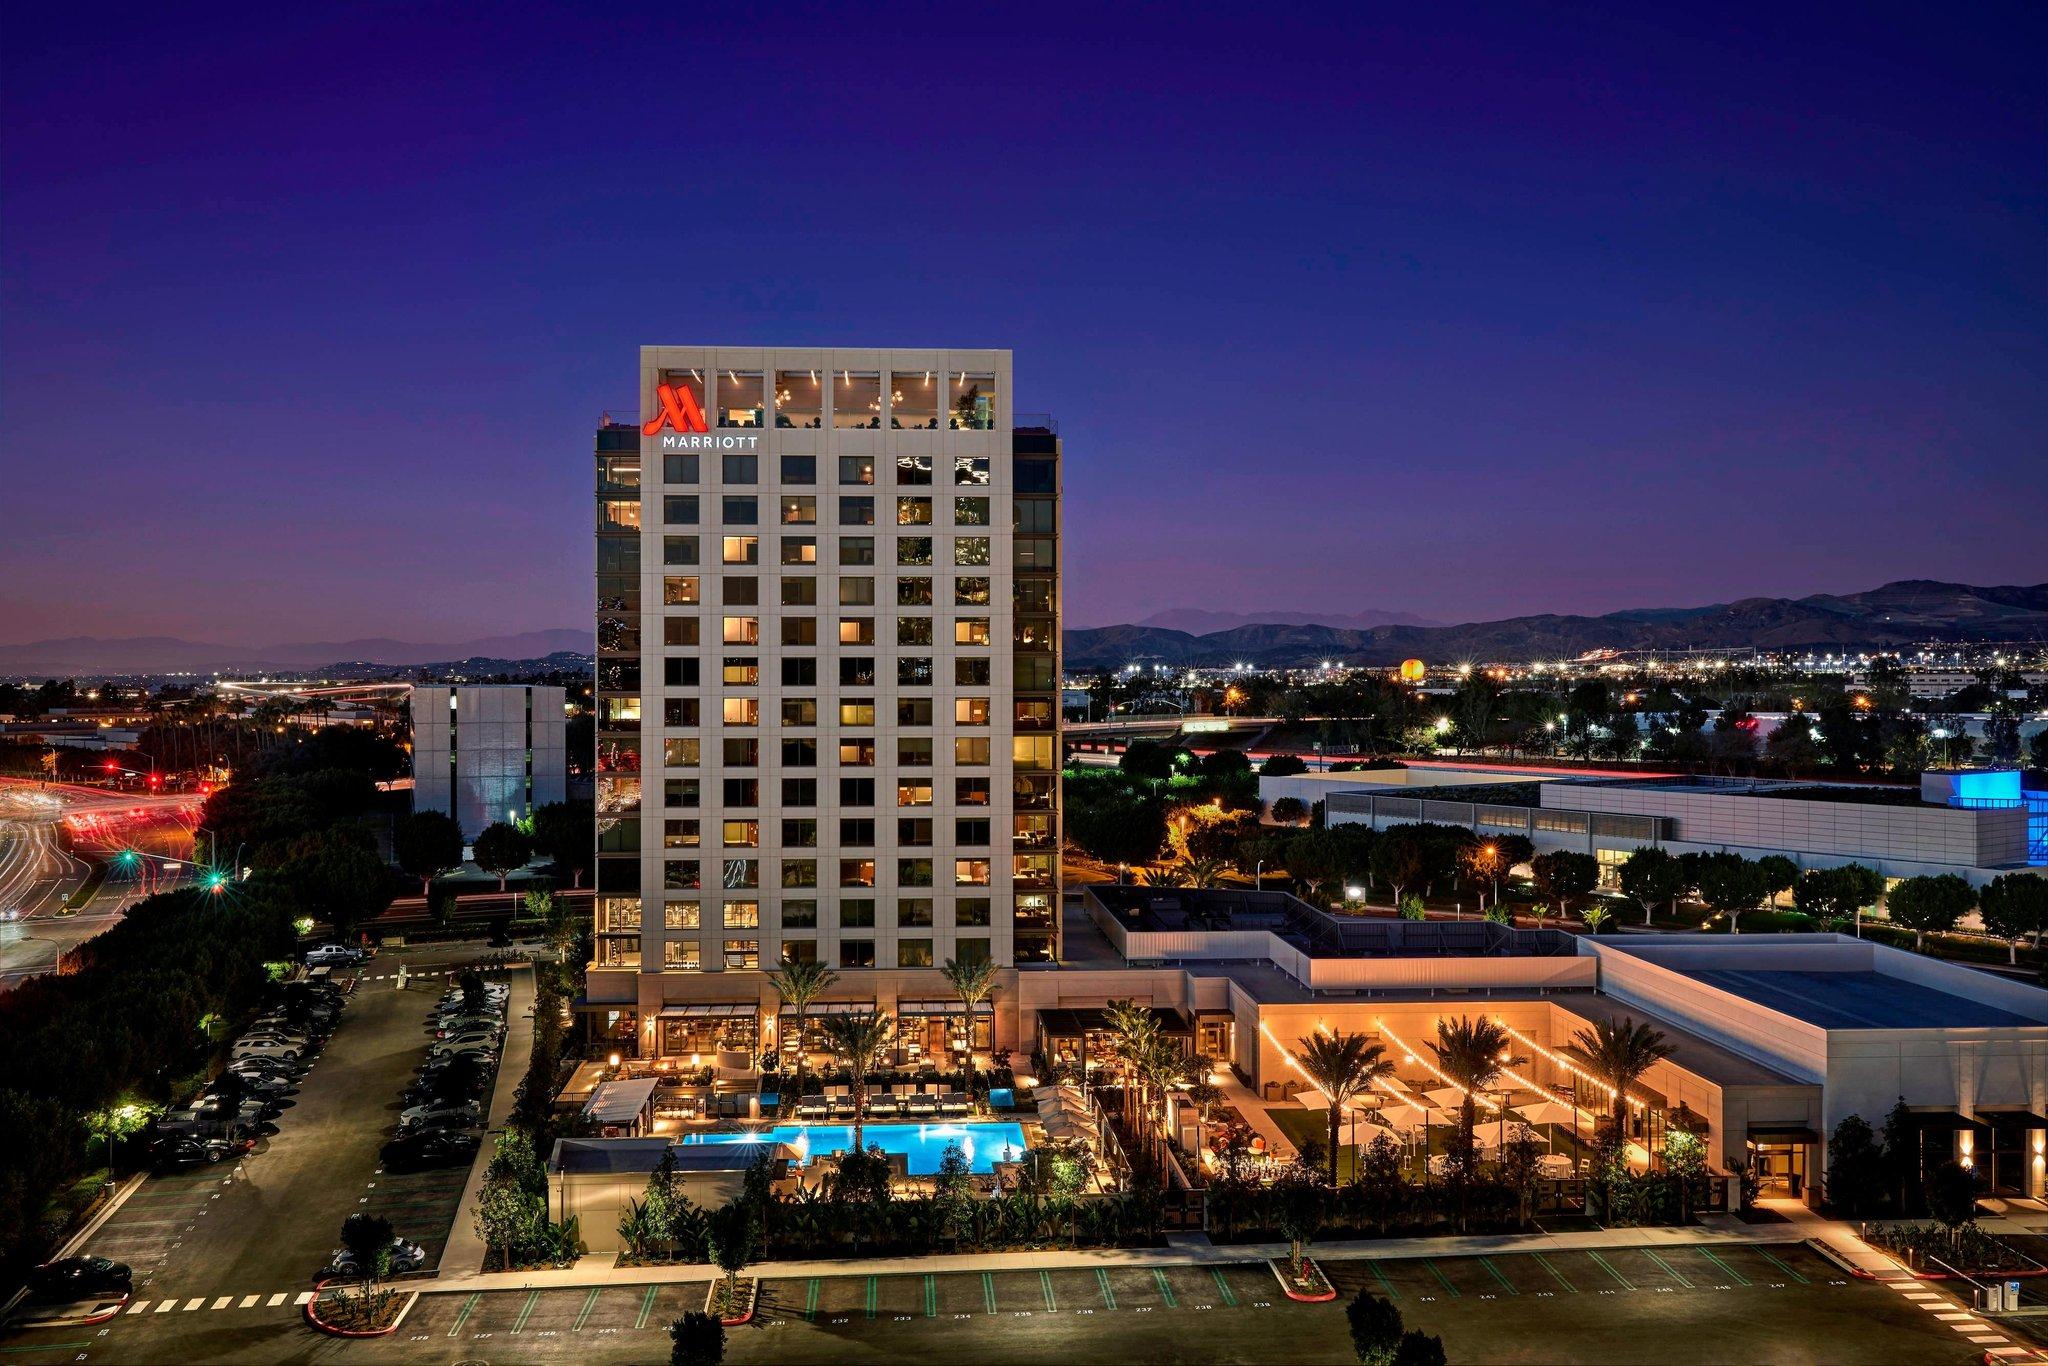 Meetings And Events At Marriott Irvine Spectrum Irvine Ca Us